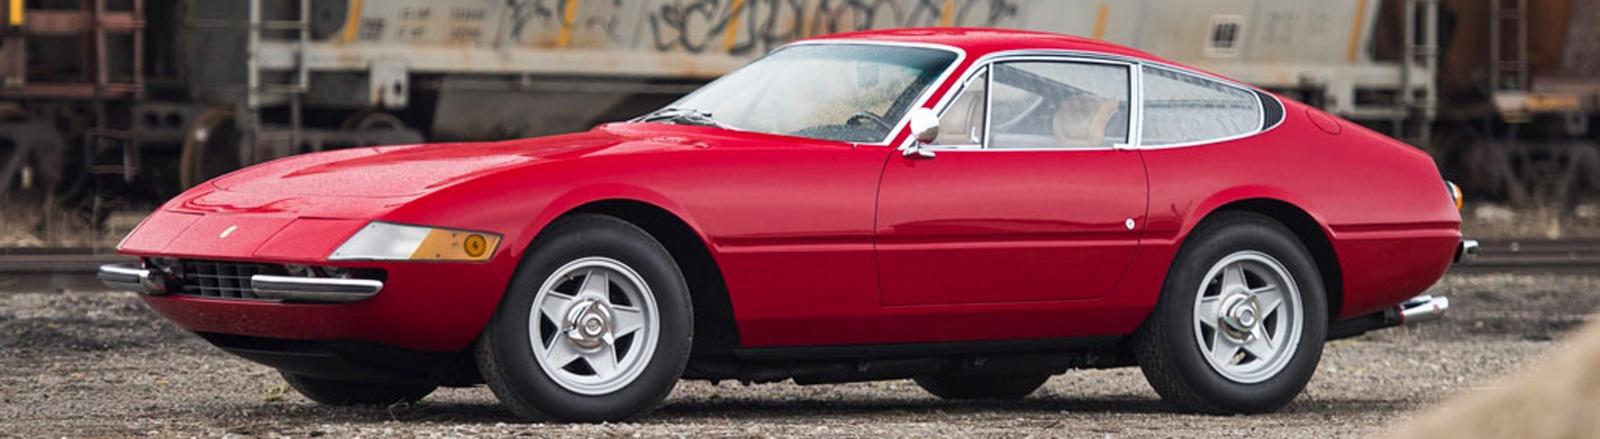 Ferrari's: Hollen of stilstaan bij Villa Erba